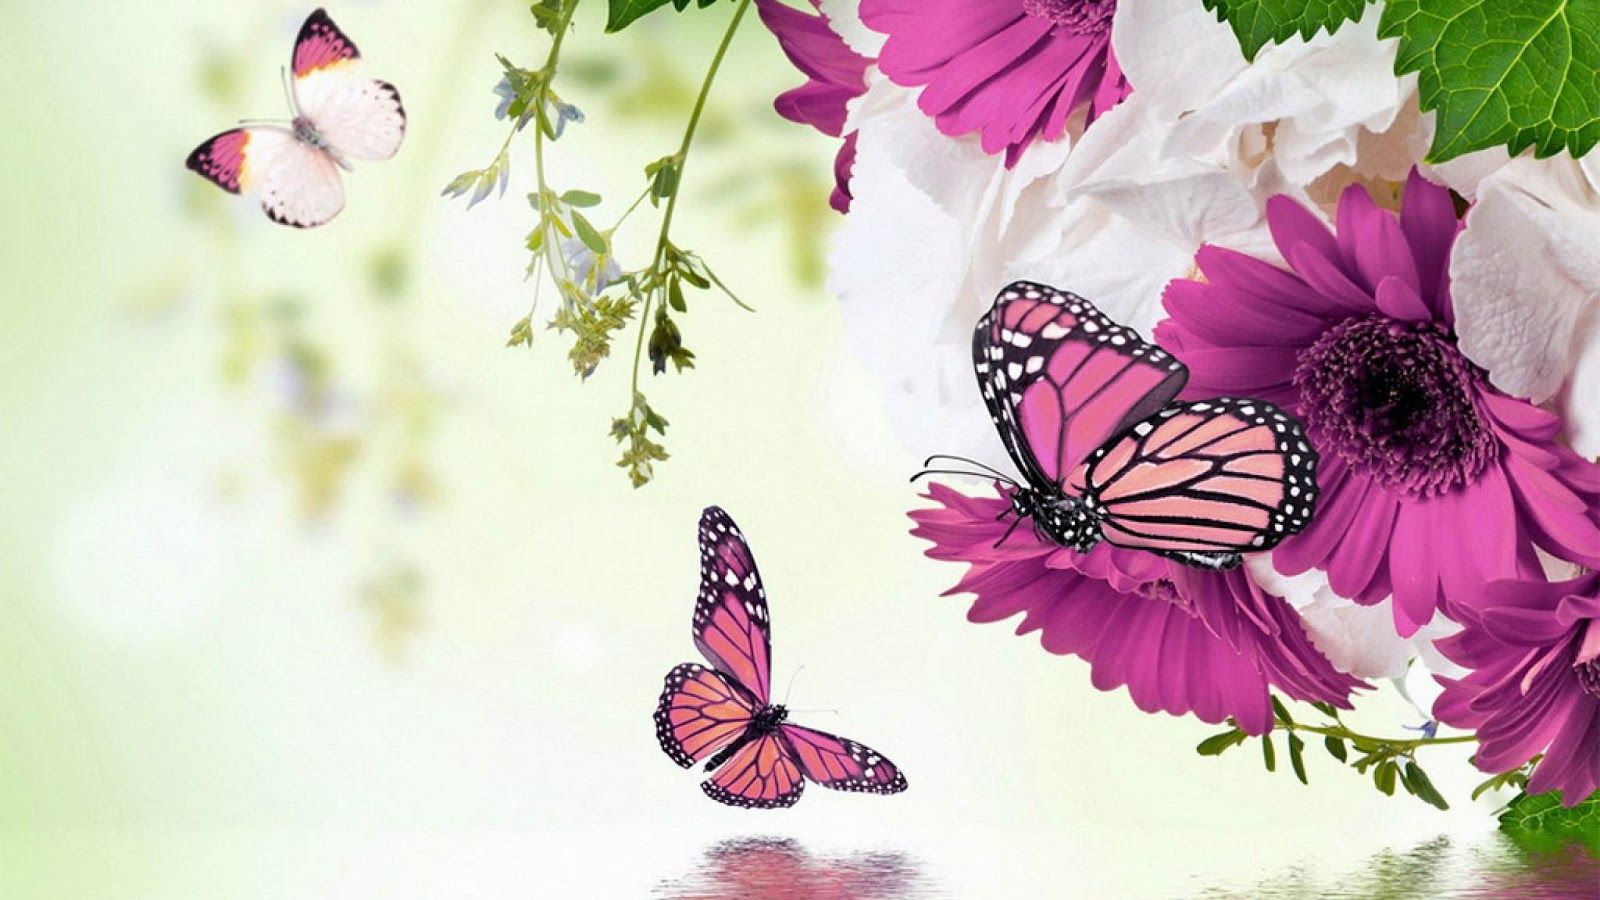 Imagenes De Flores Bonitas Para Fondo De Pantalla Imagenes De Flores Hermosas Fondos De Pantalla Pc Papel Pintado De Mariposa Flores Rosa